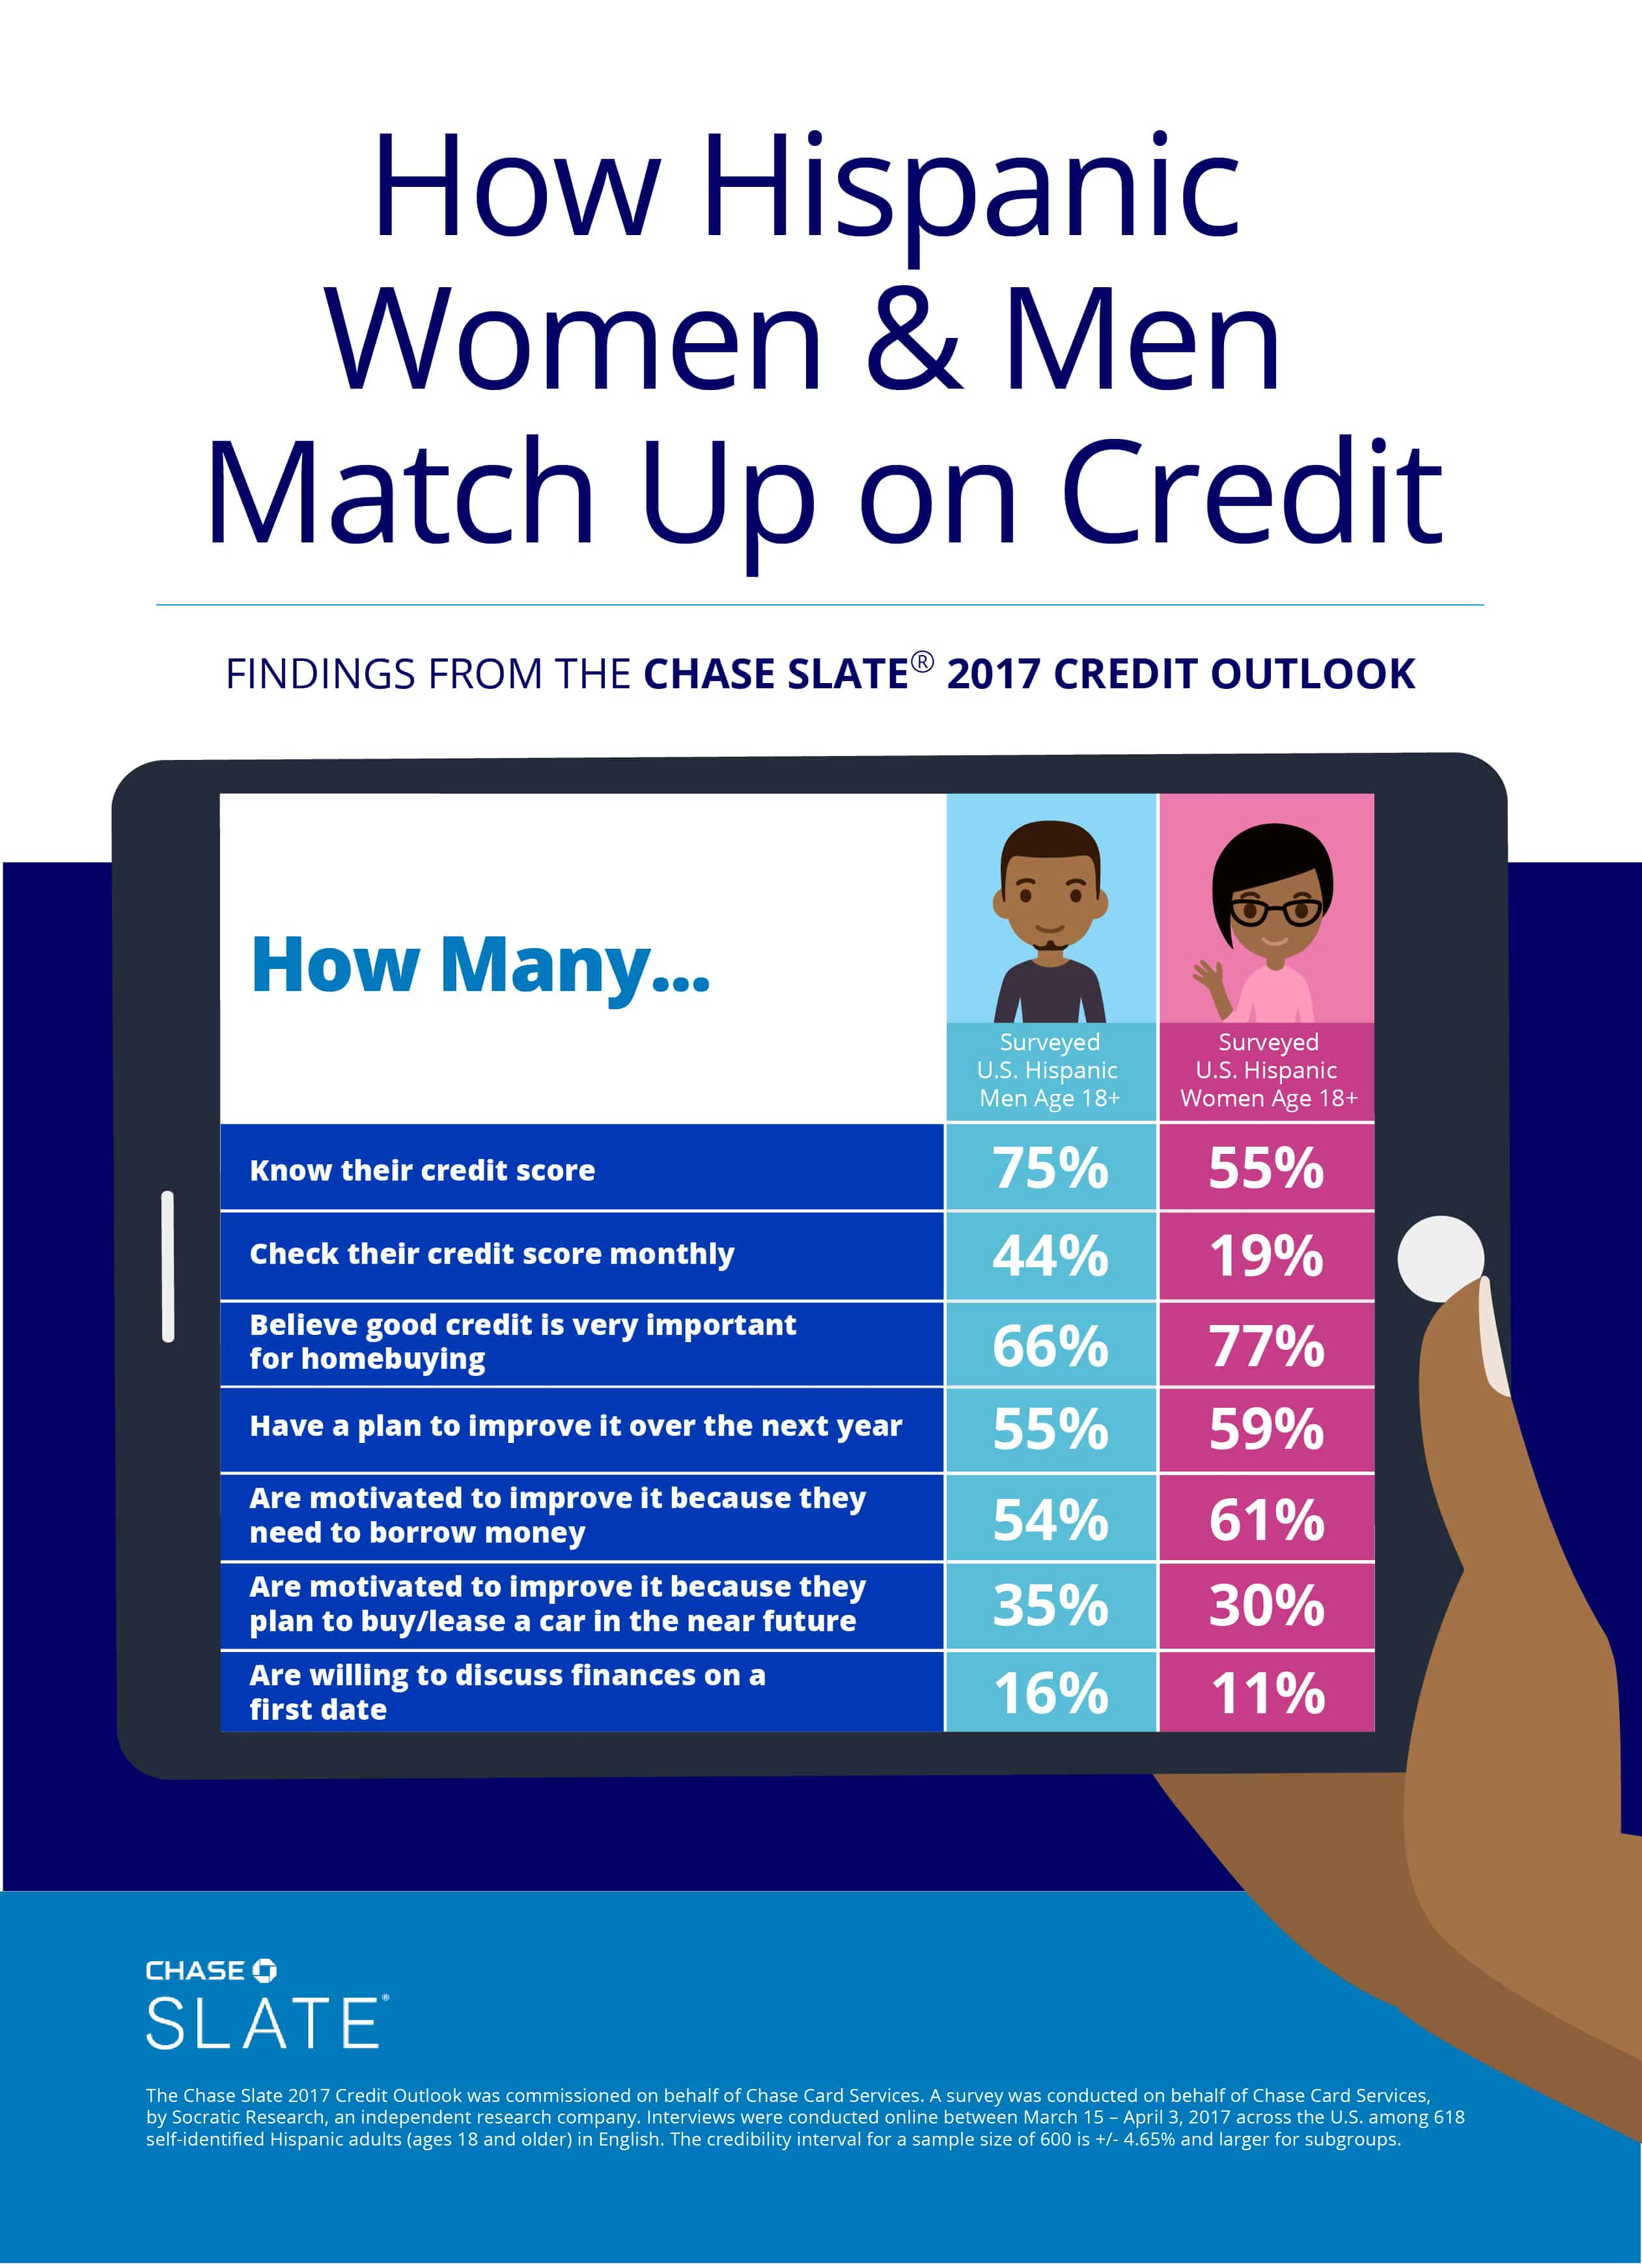 How Hispanic men and Hispanic women match up on credit - Chase Slate findings